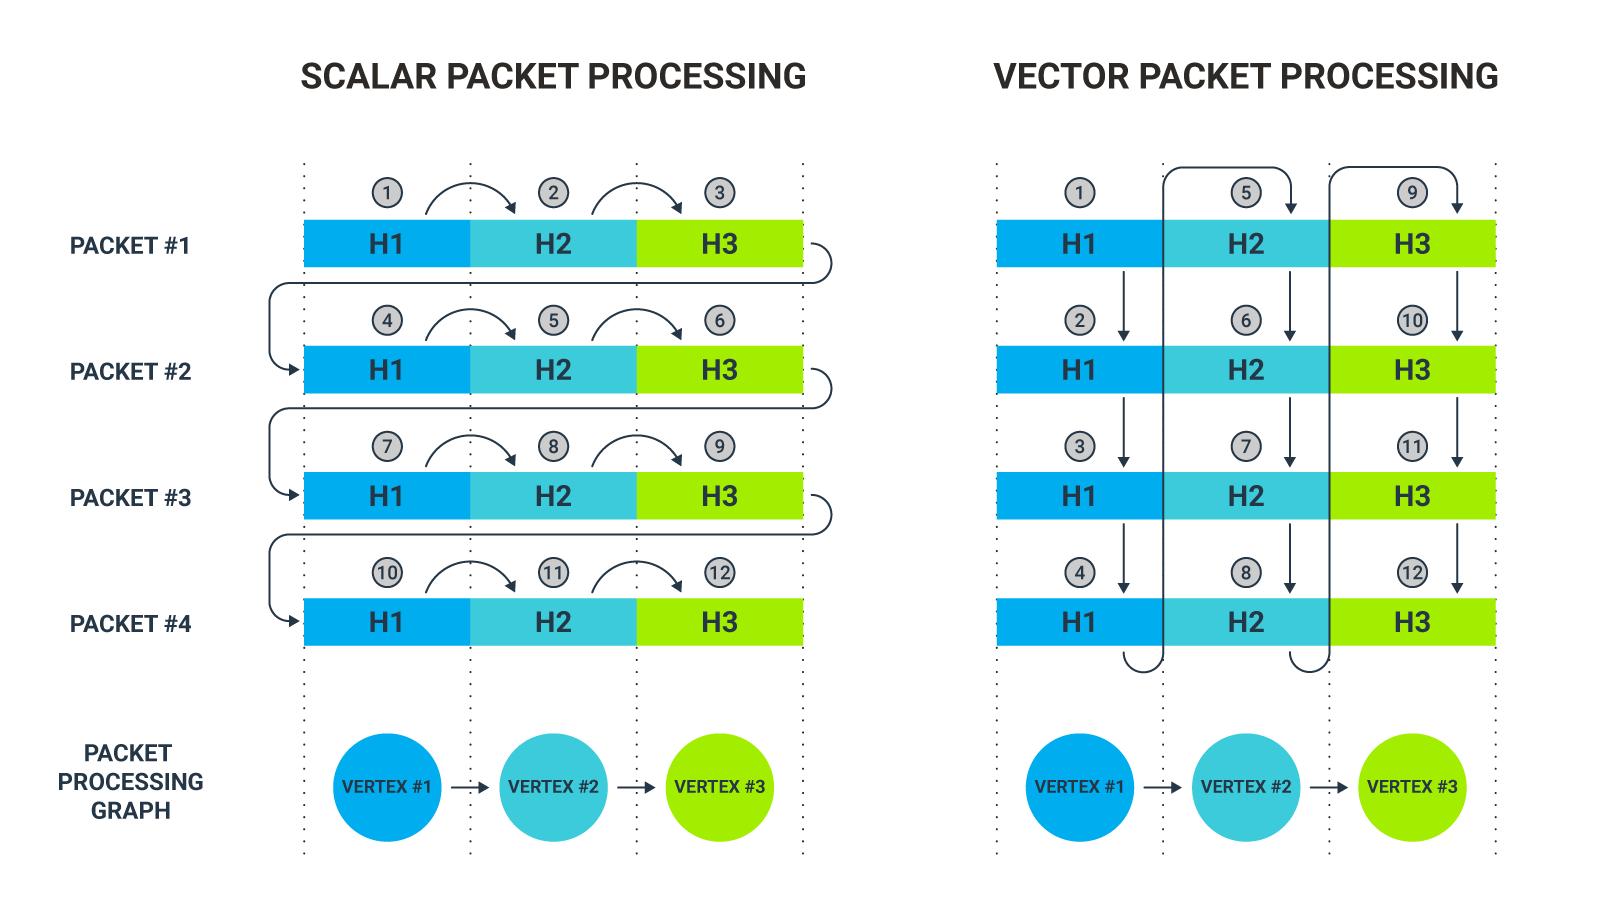 Scalar packet processing vs vector packet processing